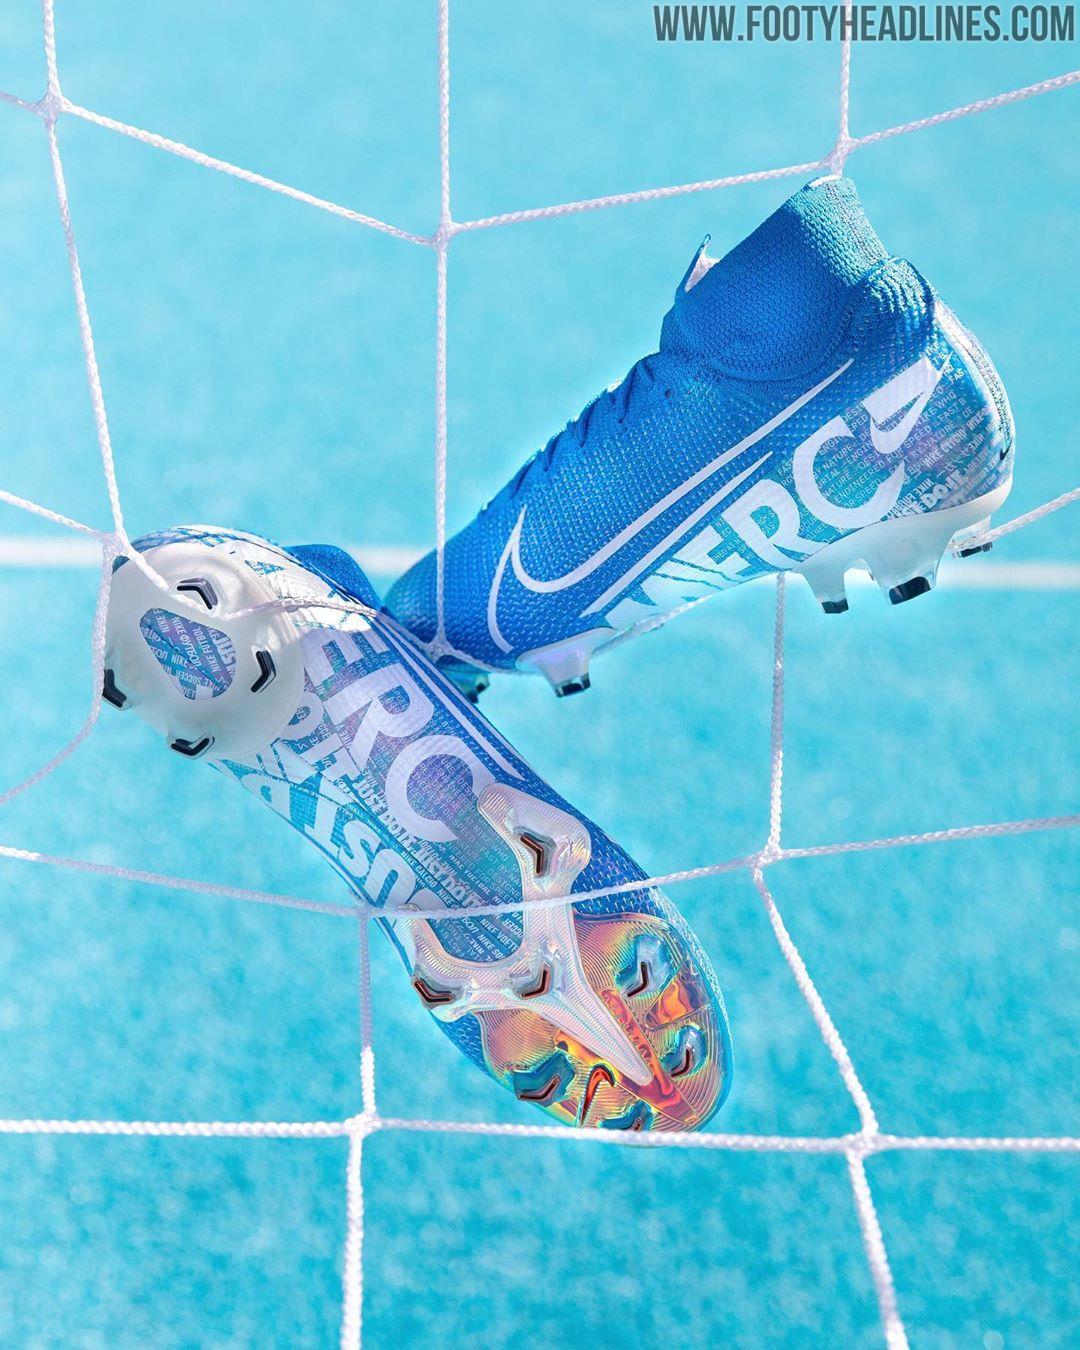 Preguntar Mucho bien bueno palma  Super Bold Nike 'New Lights' 2019-2020 Boots Released - Including Next-Gen  Mercurial & Tiempo - Footy Headlines